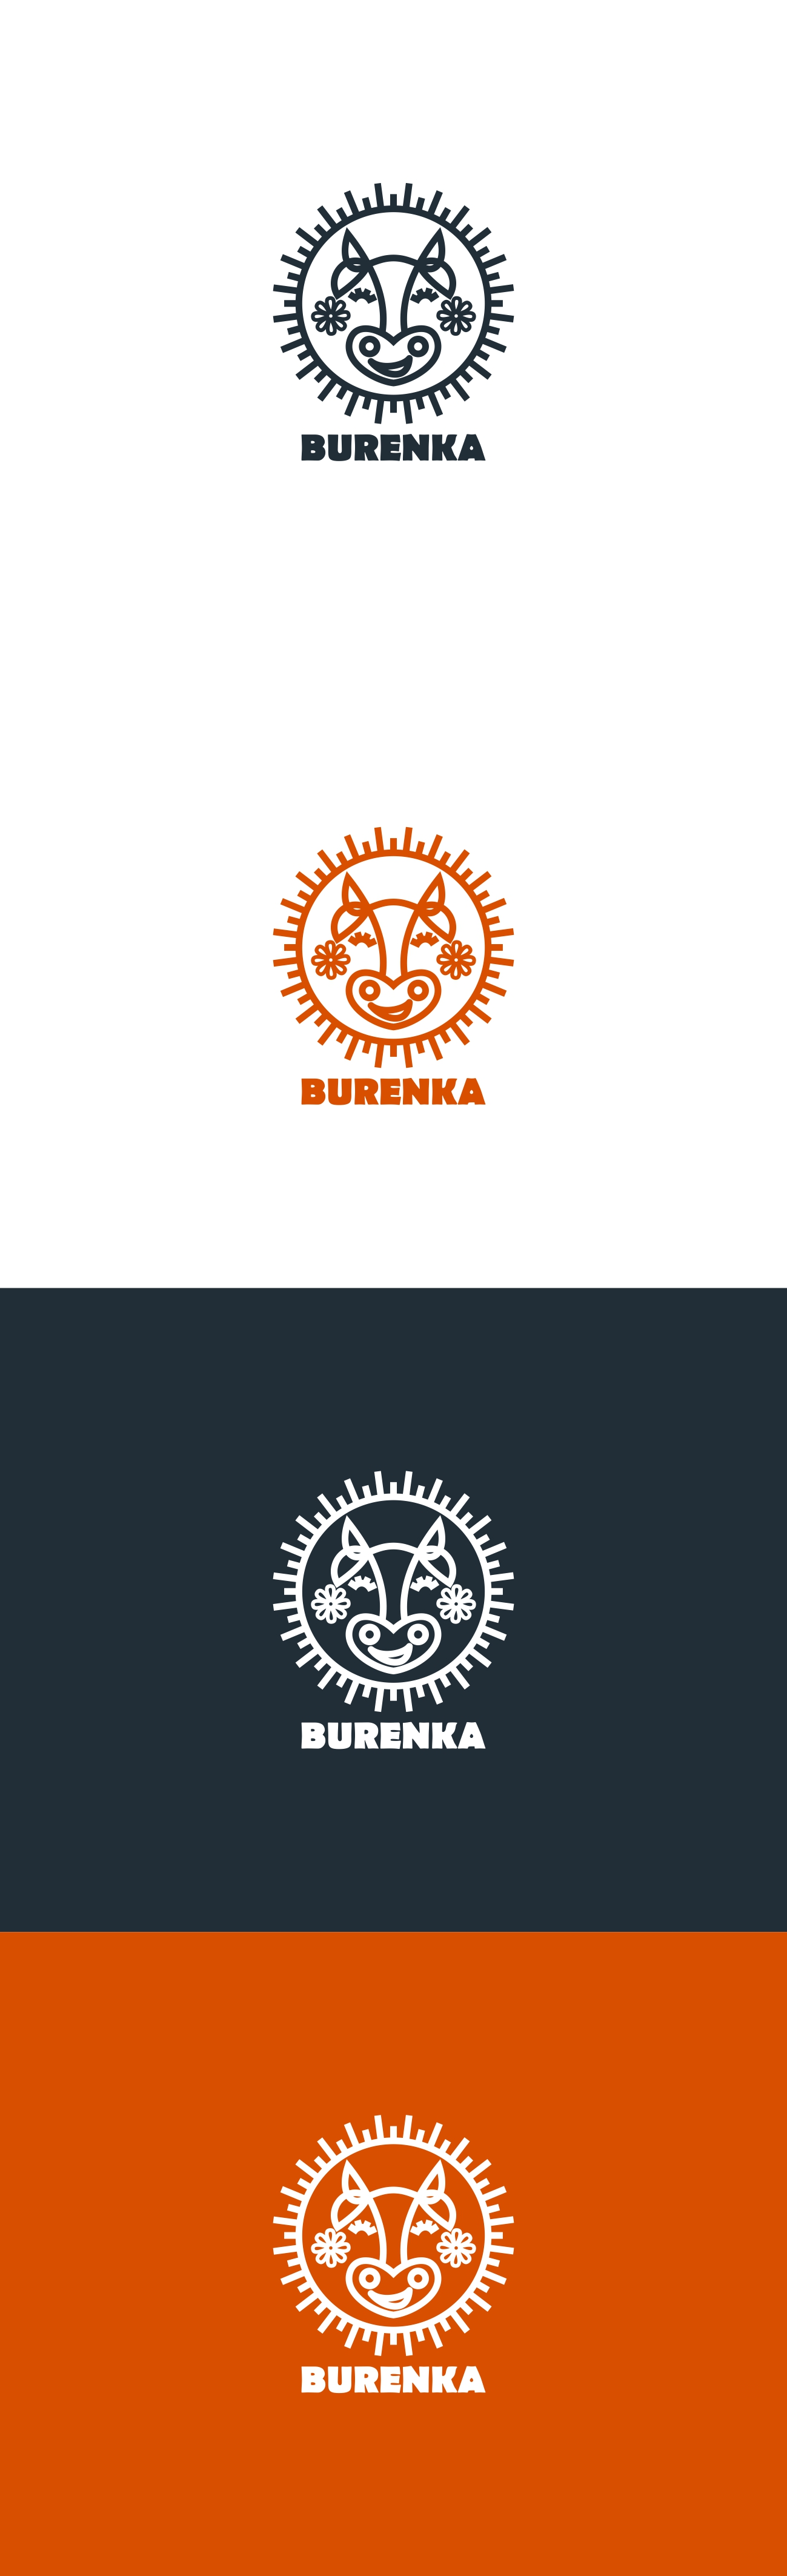 Логотип для Бургерной с Пекарней фото f_2735e1b825a9d67b.jpg